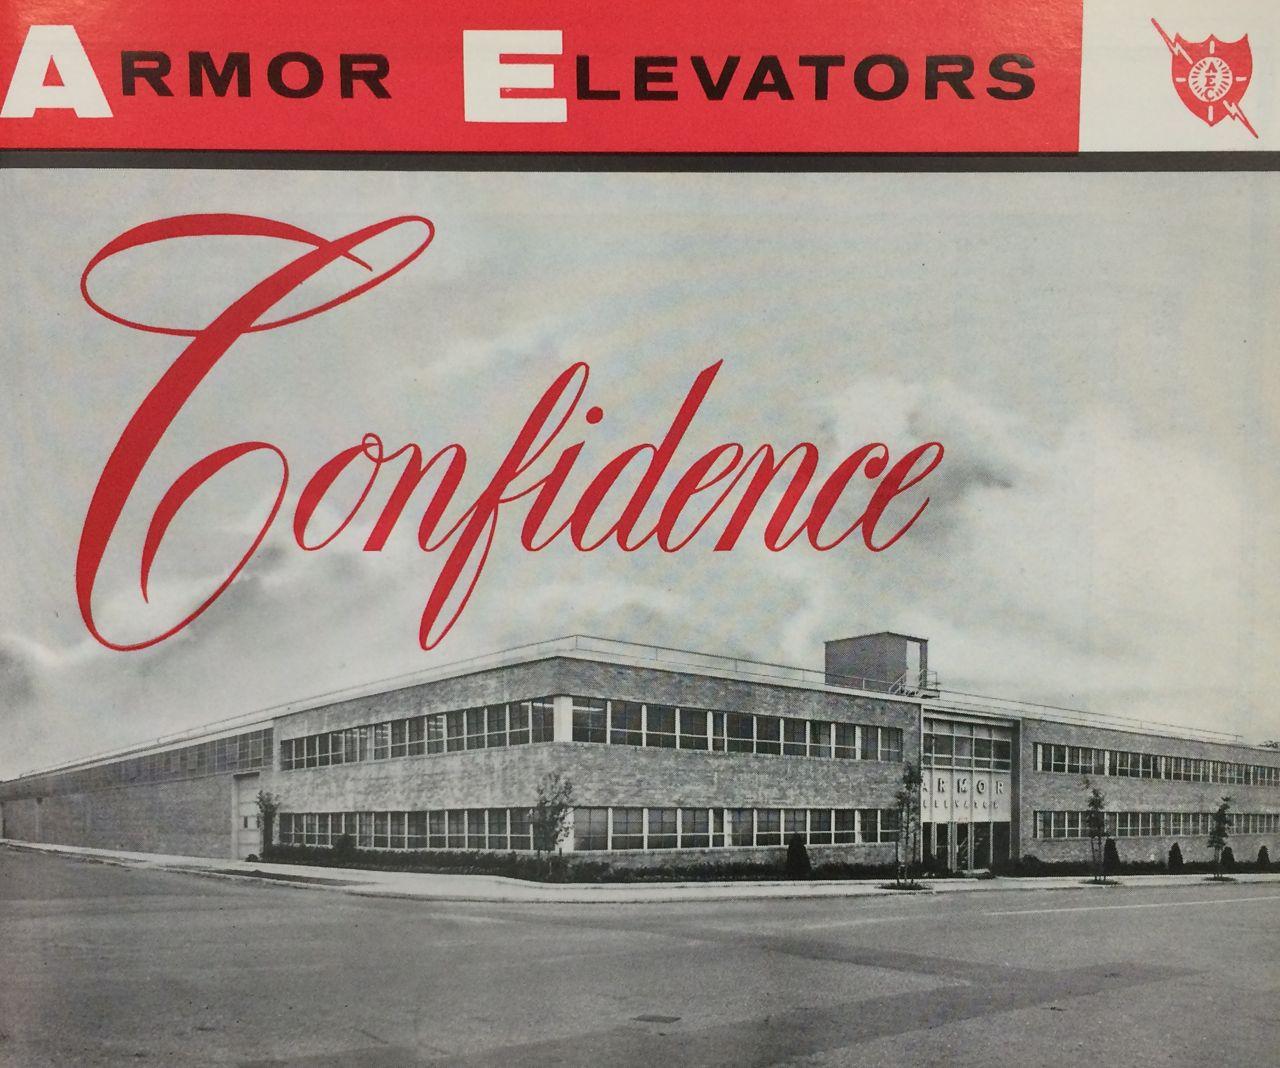 Armor Elevator Company